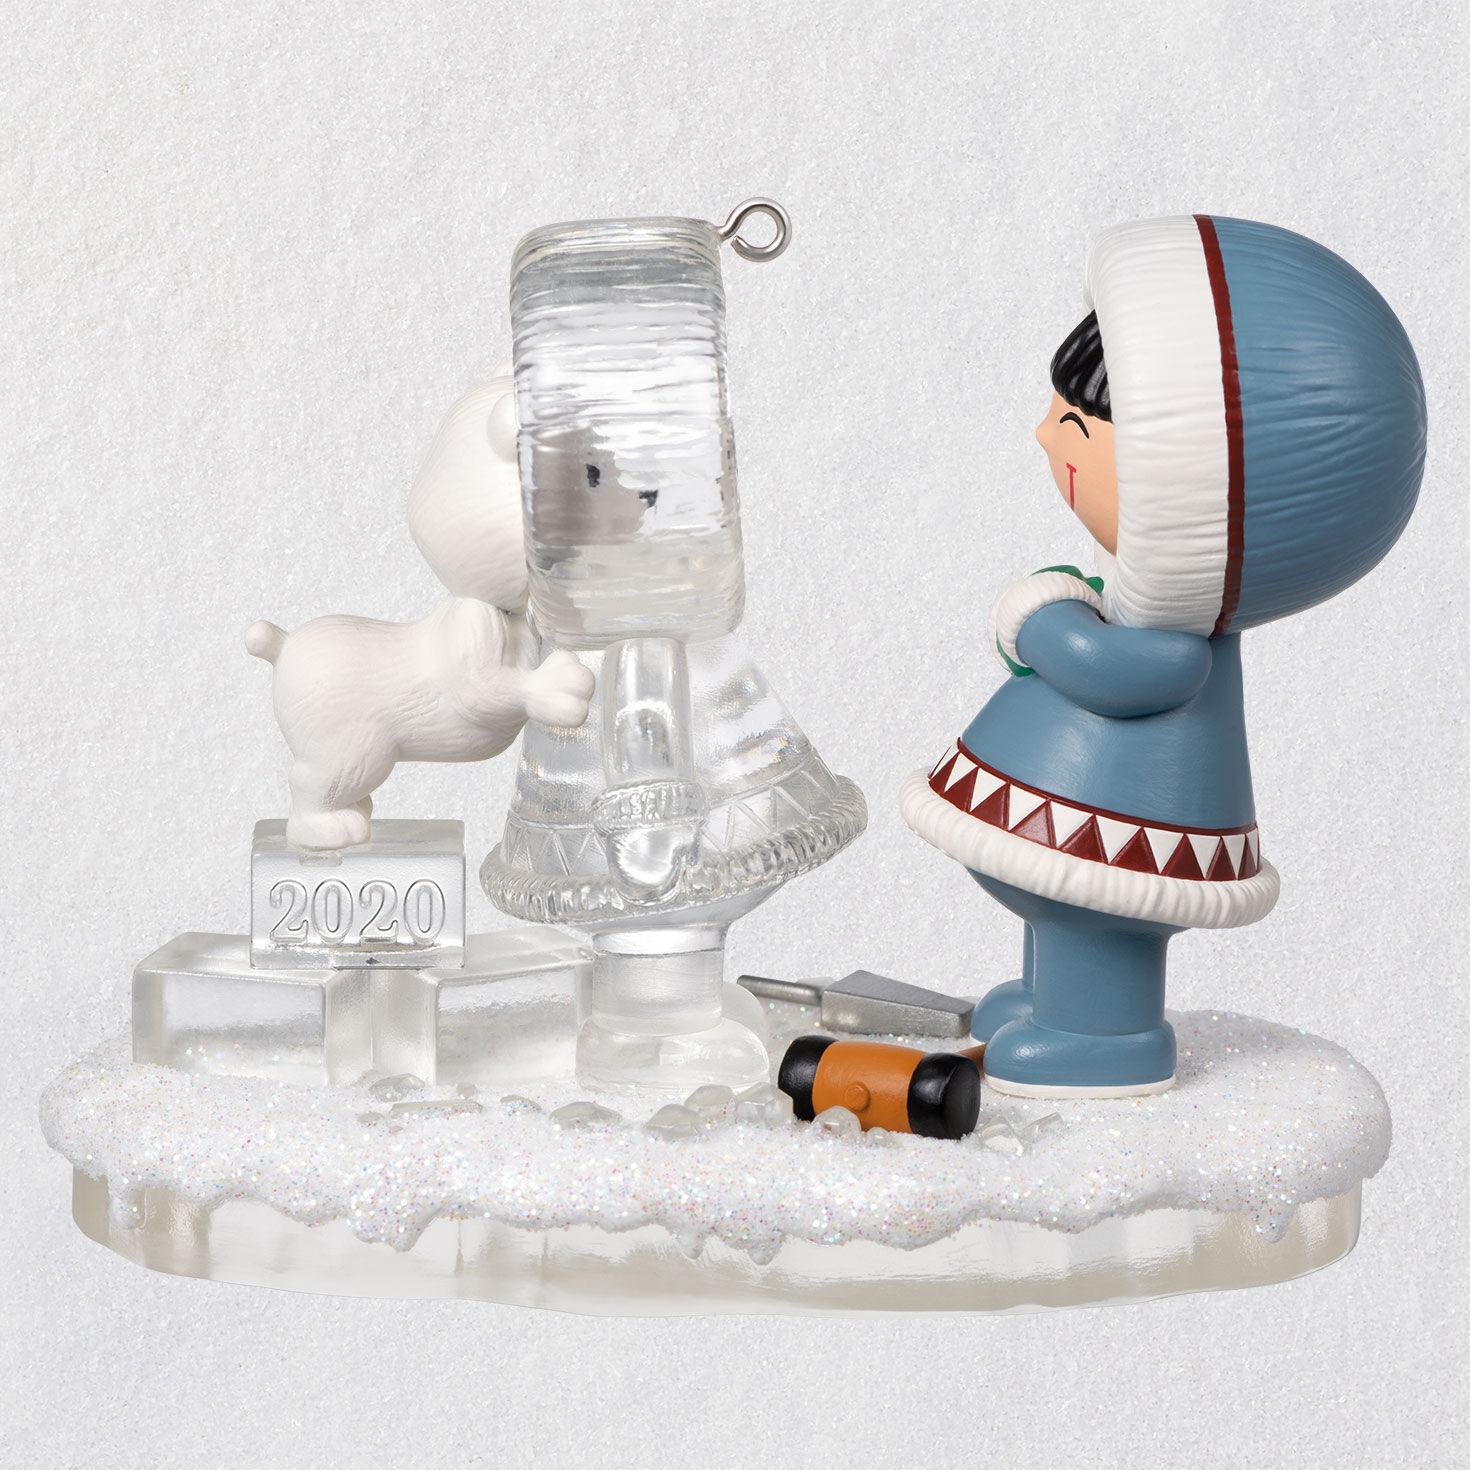 Frosty Friends 2020 Ornament   Keepsake Ornaments   Hallmark